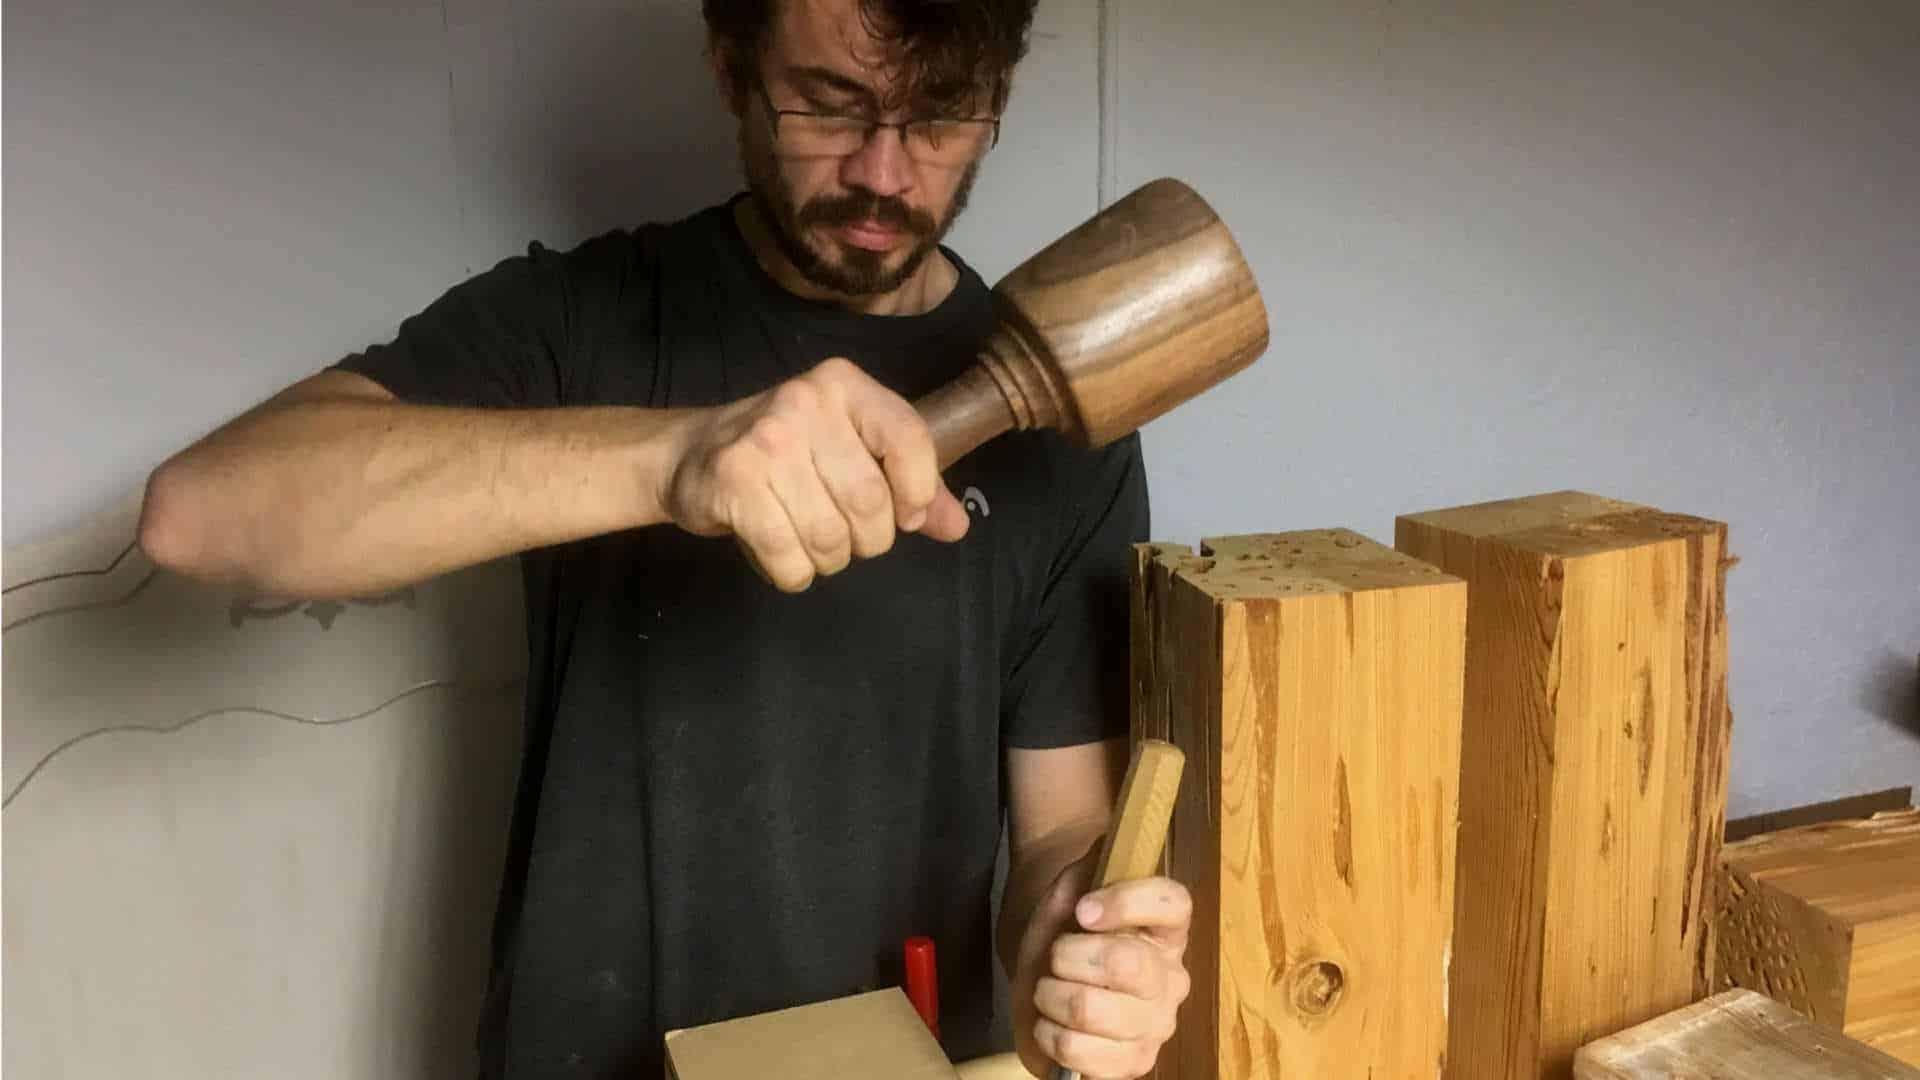 cedar wood good for woodcarving